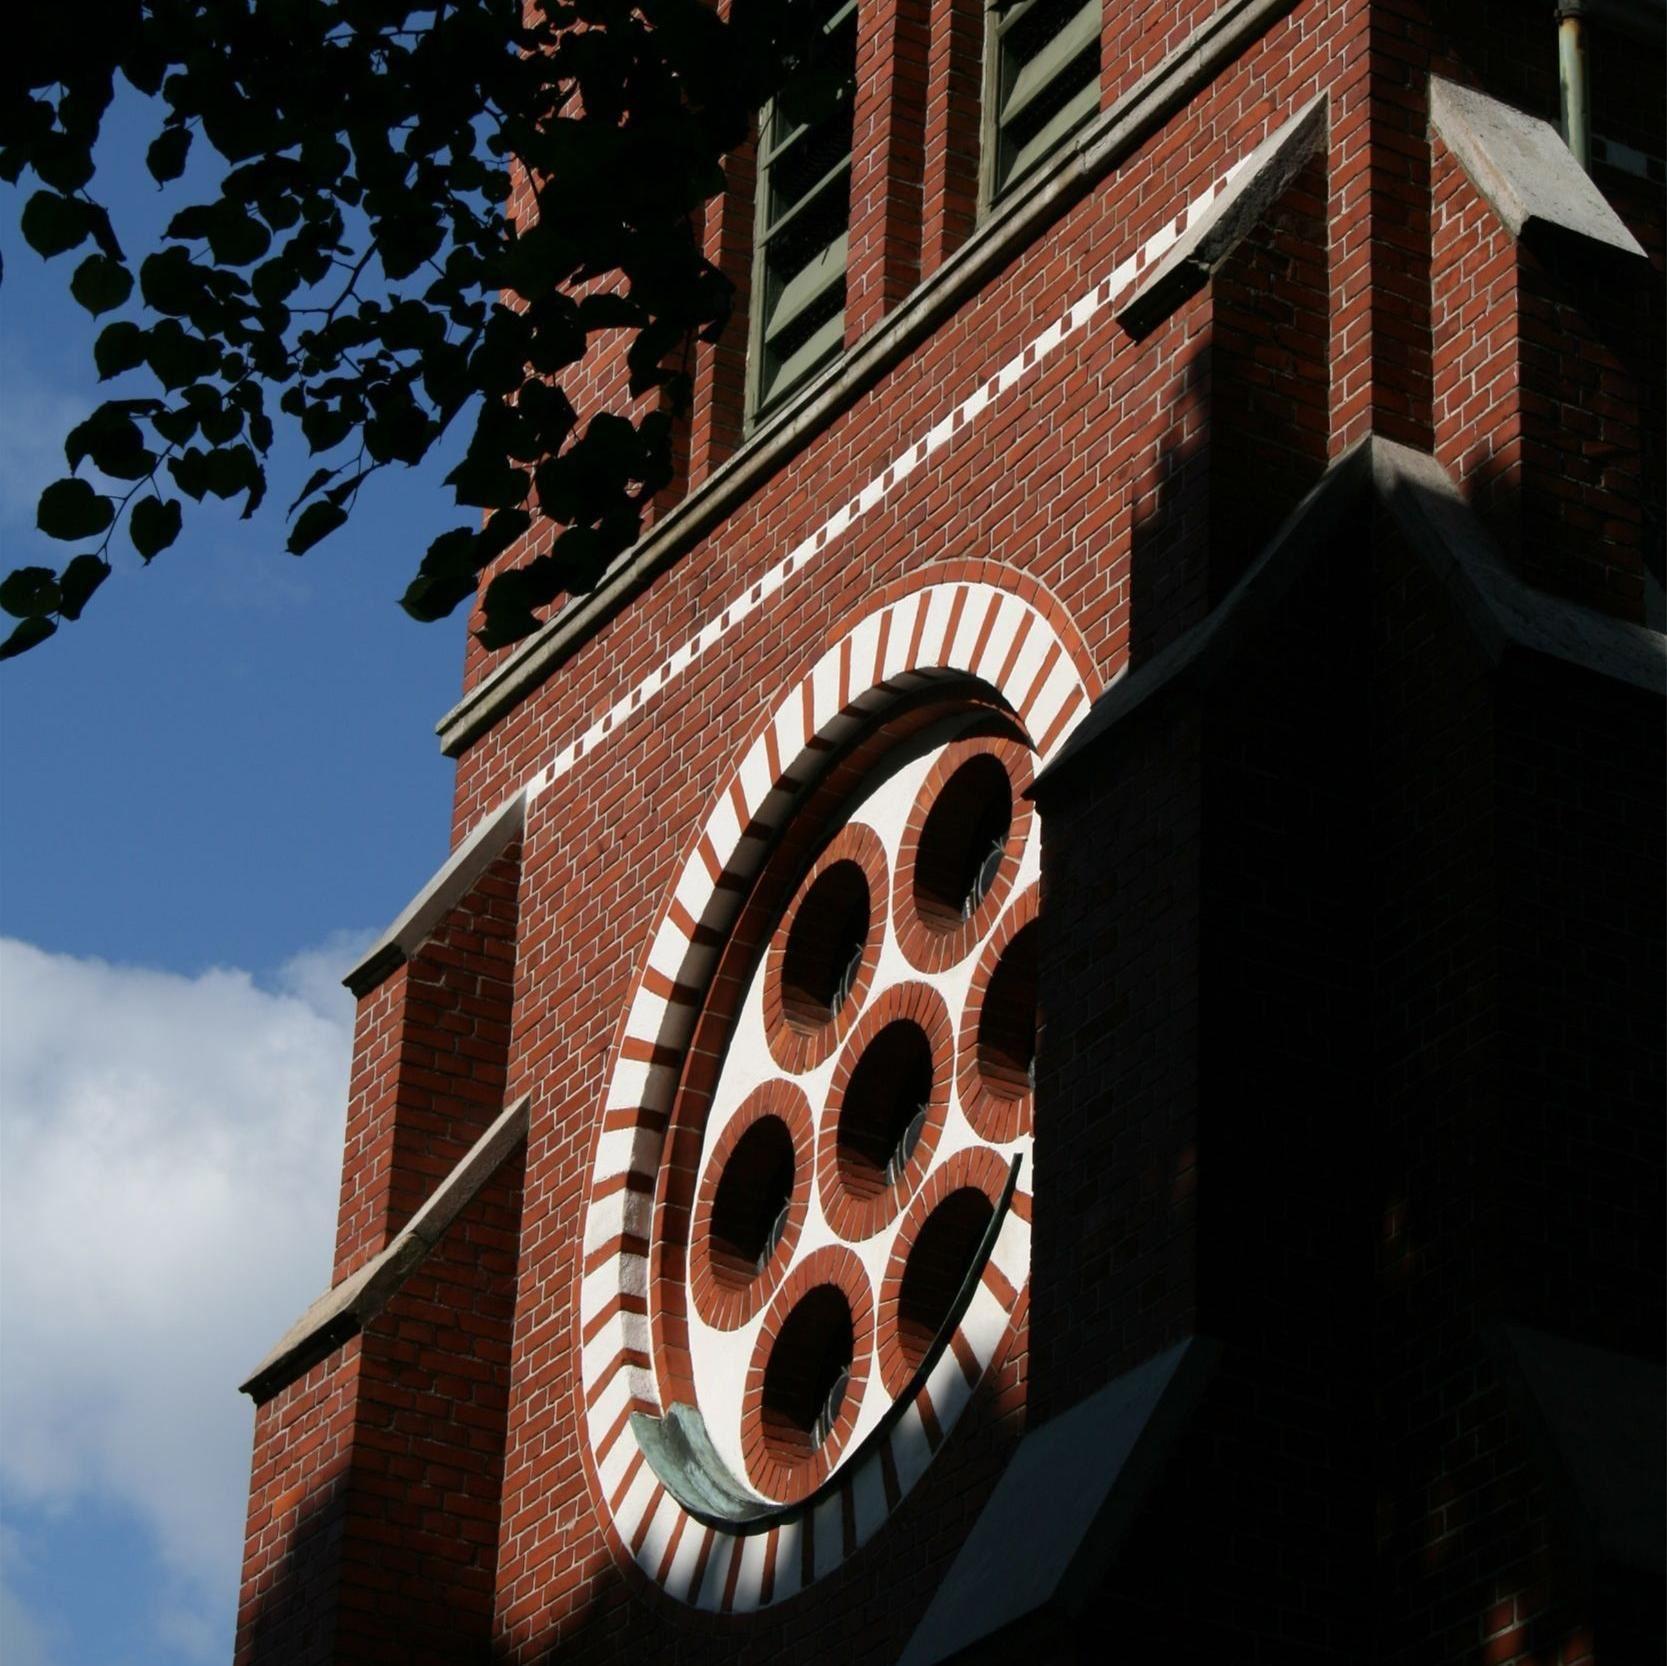 © Kävlinge kommun, Korsbacka Kirche